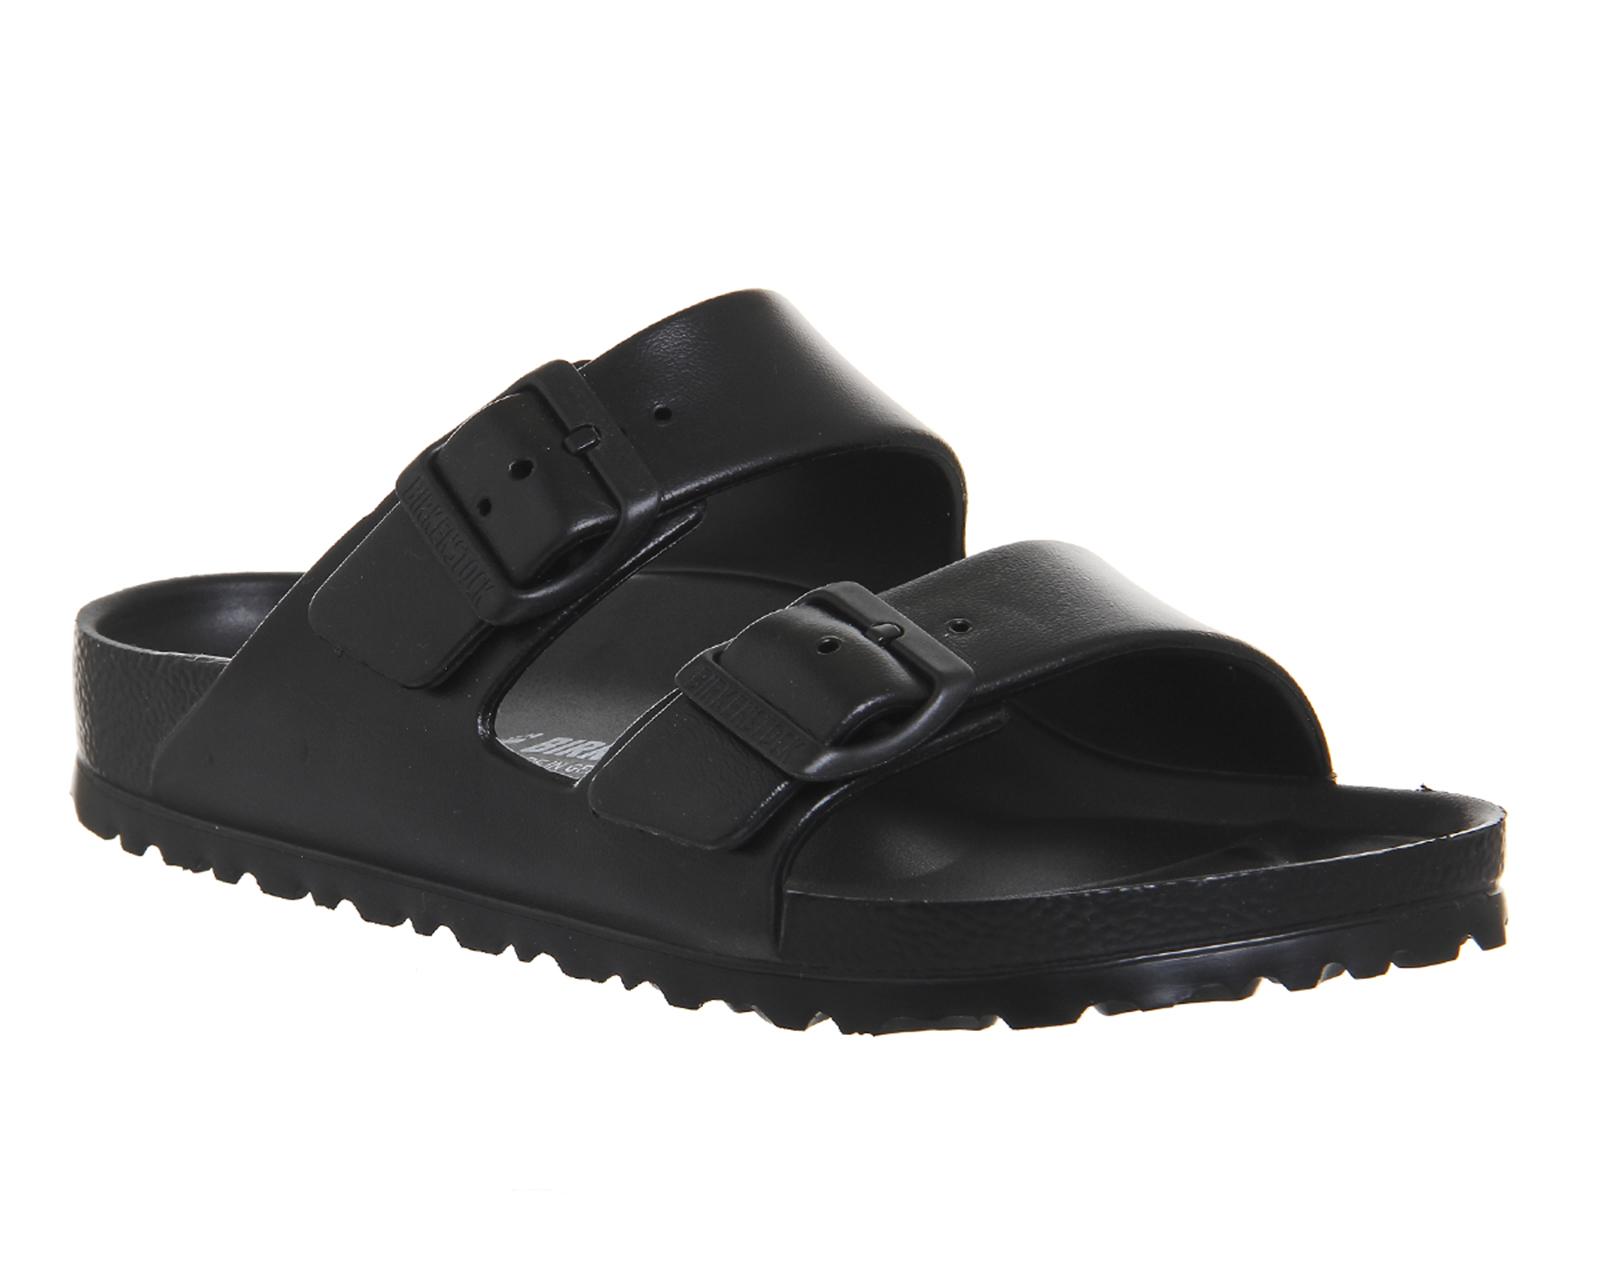 0e142a5e80b6 Sentinel Womens Birkenstock Arizona Two Strap Sandals BLACK EVA Sandals